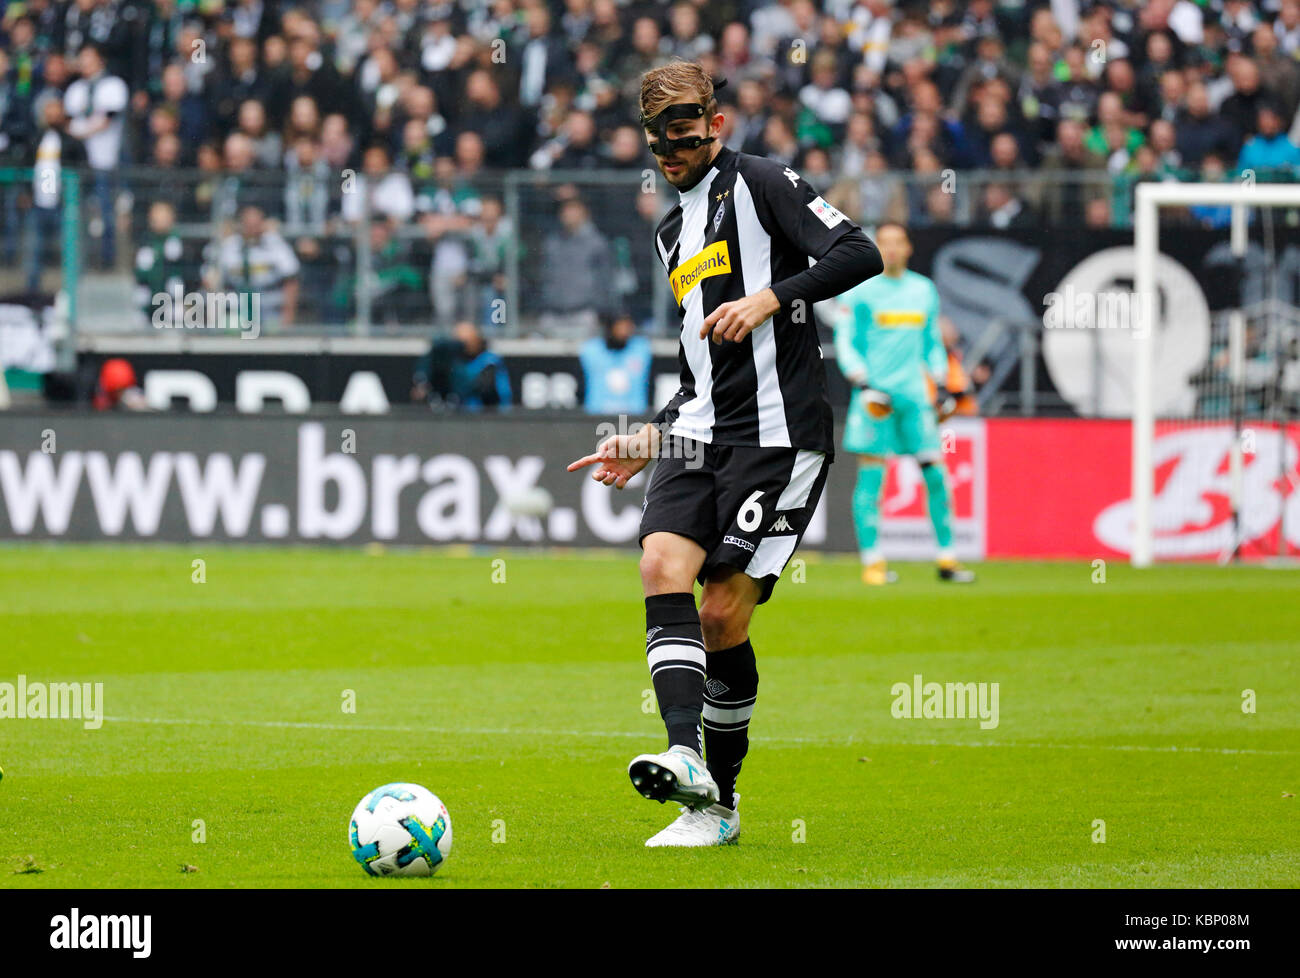 sports, football, Bundesliga, 2017/2018, Borussia Moenchengladbach vs Hannover 96 2:1, Stadium Borussia Park, scene - Stock Image